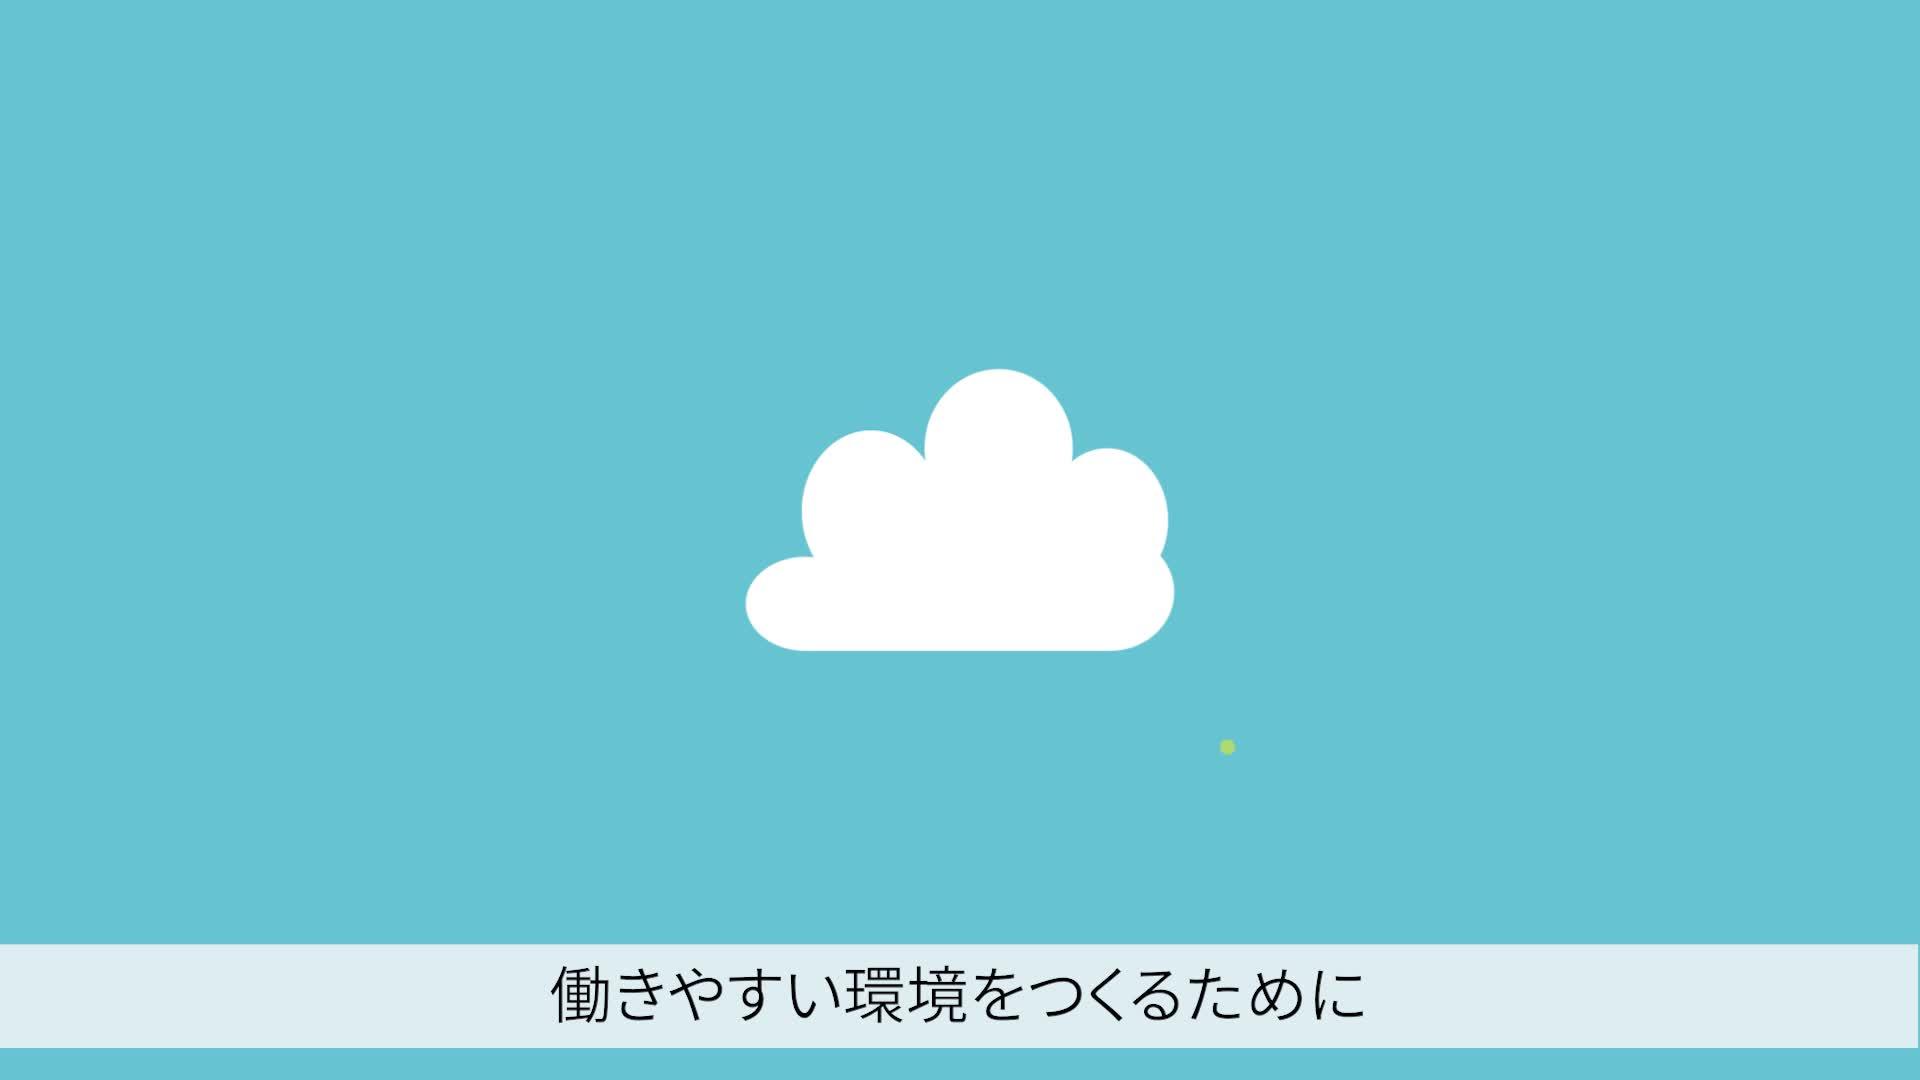 Garoonサービス紹介動画